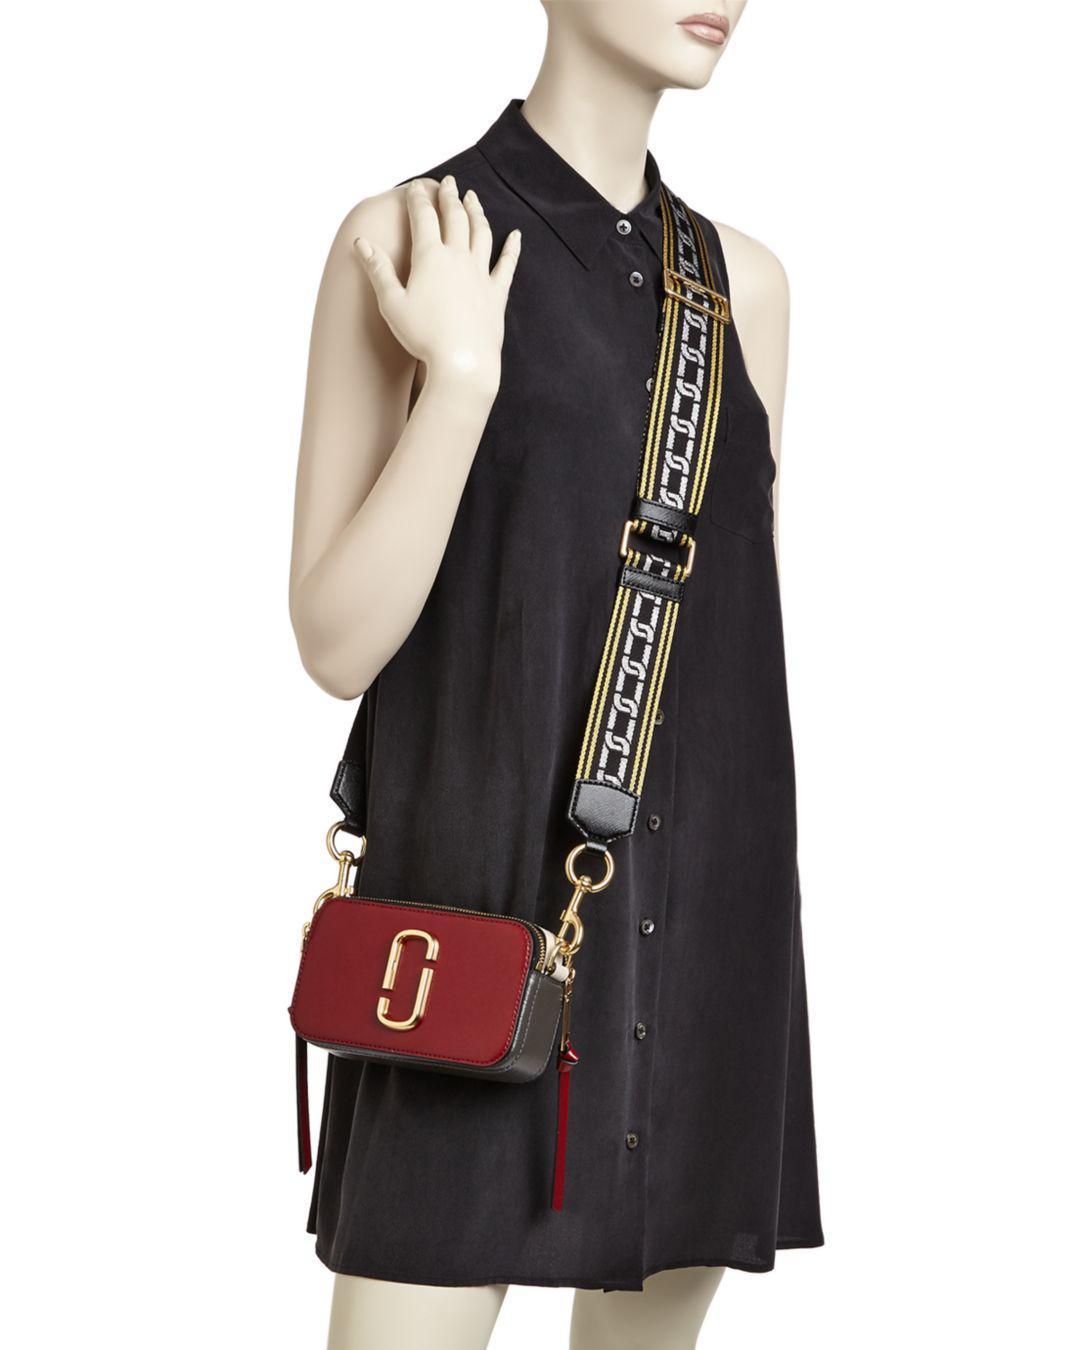 Lyst - Marc Jacobs Snapshot Cross Body Bag - Save 20% d88f0bd9120e5